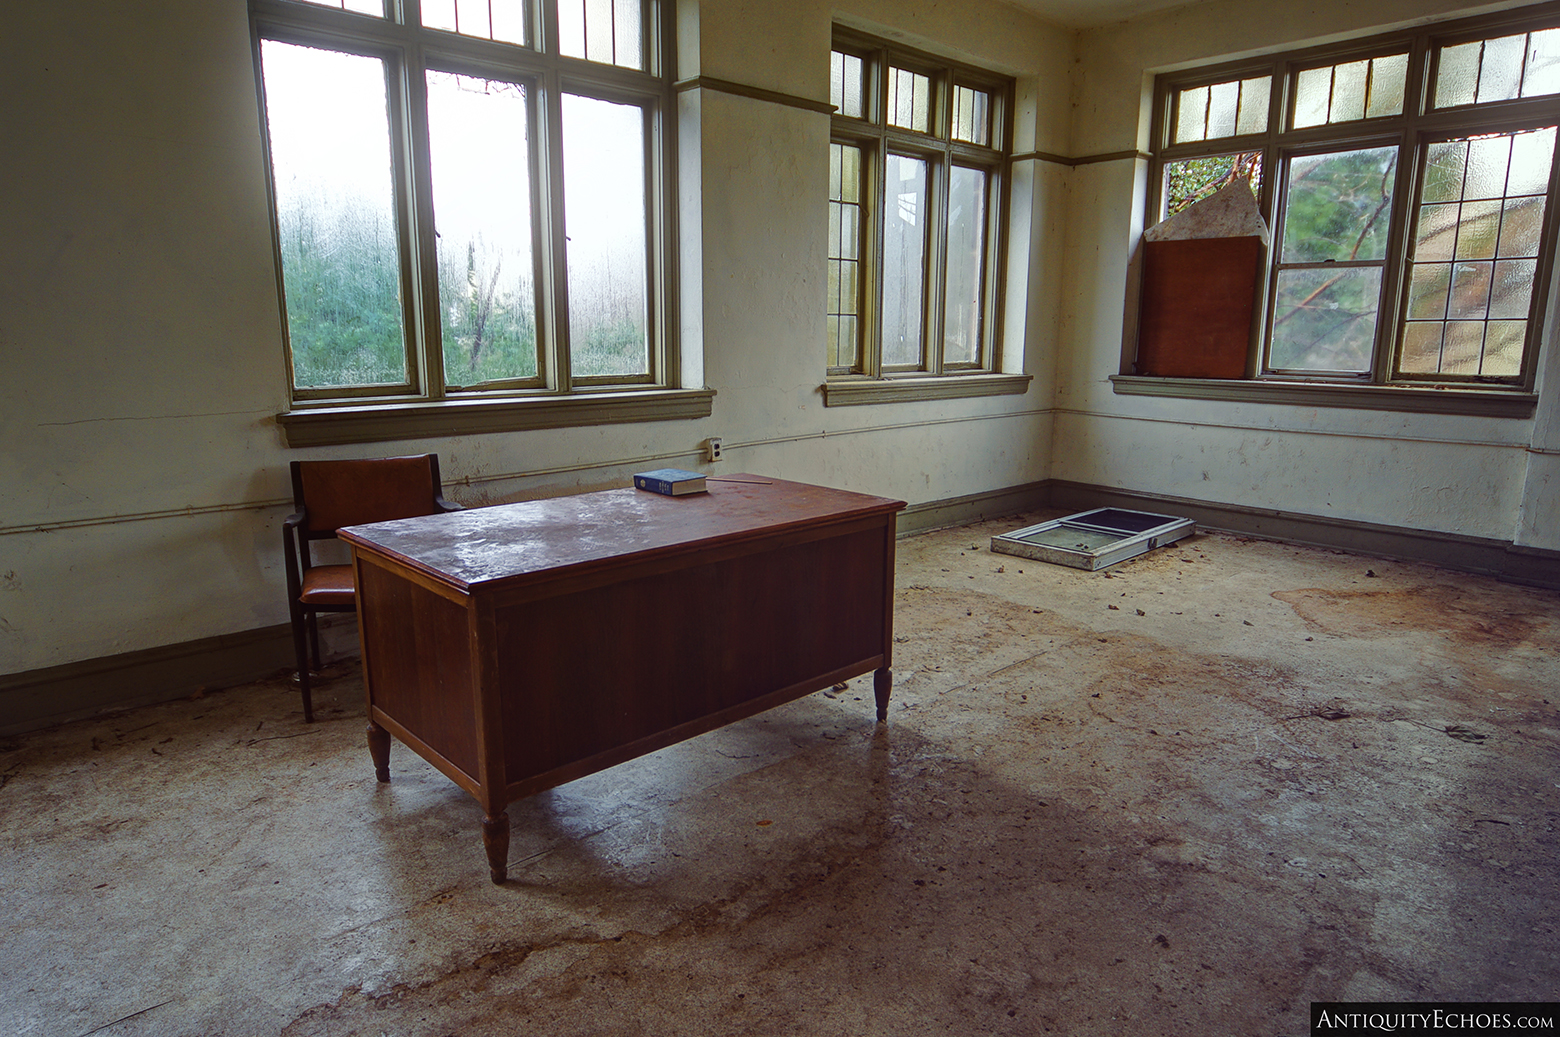 Third Presbyterian - A Lonely Office Desk